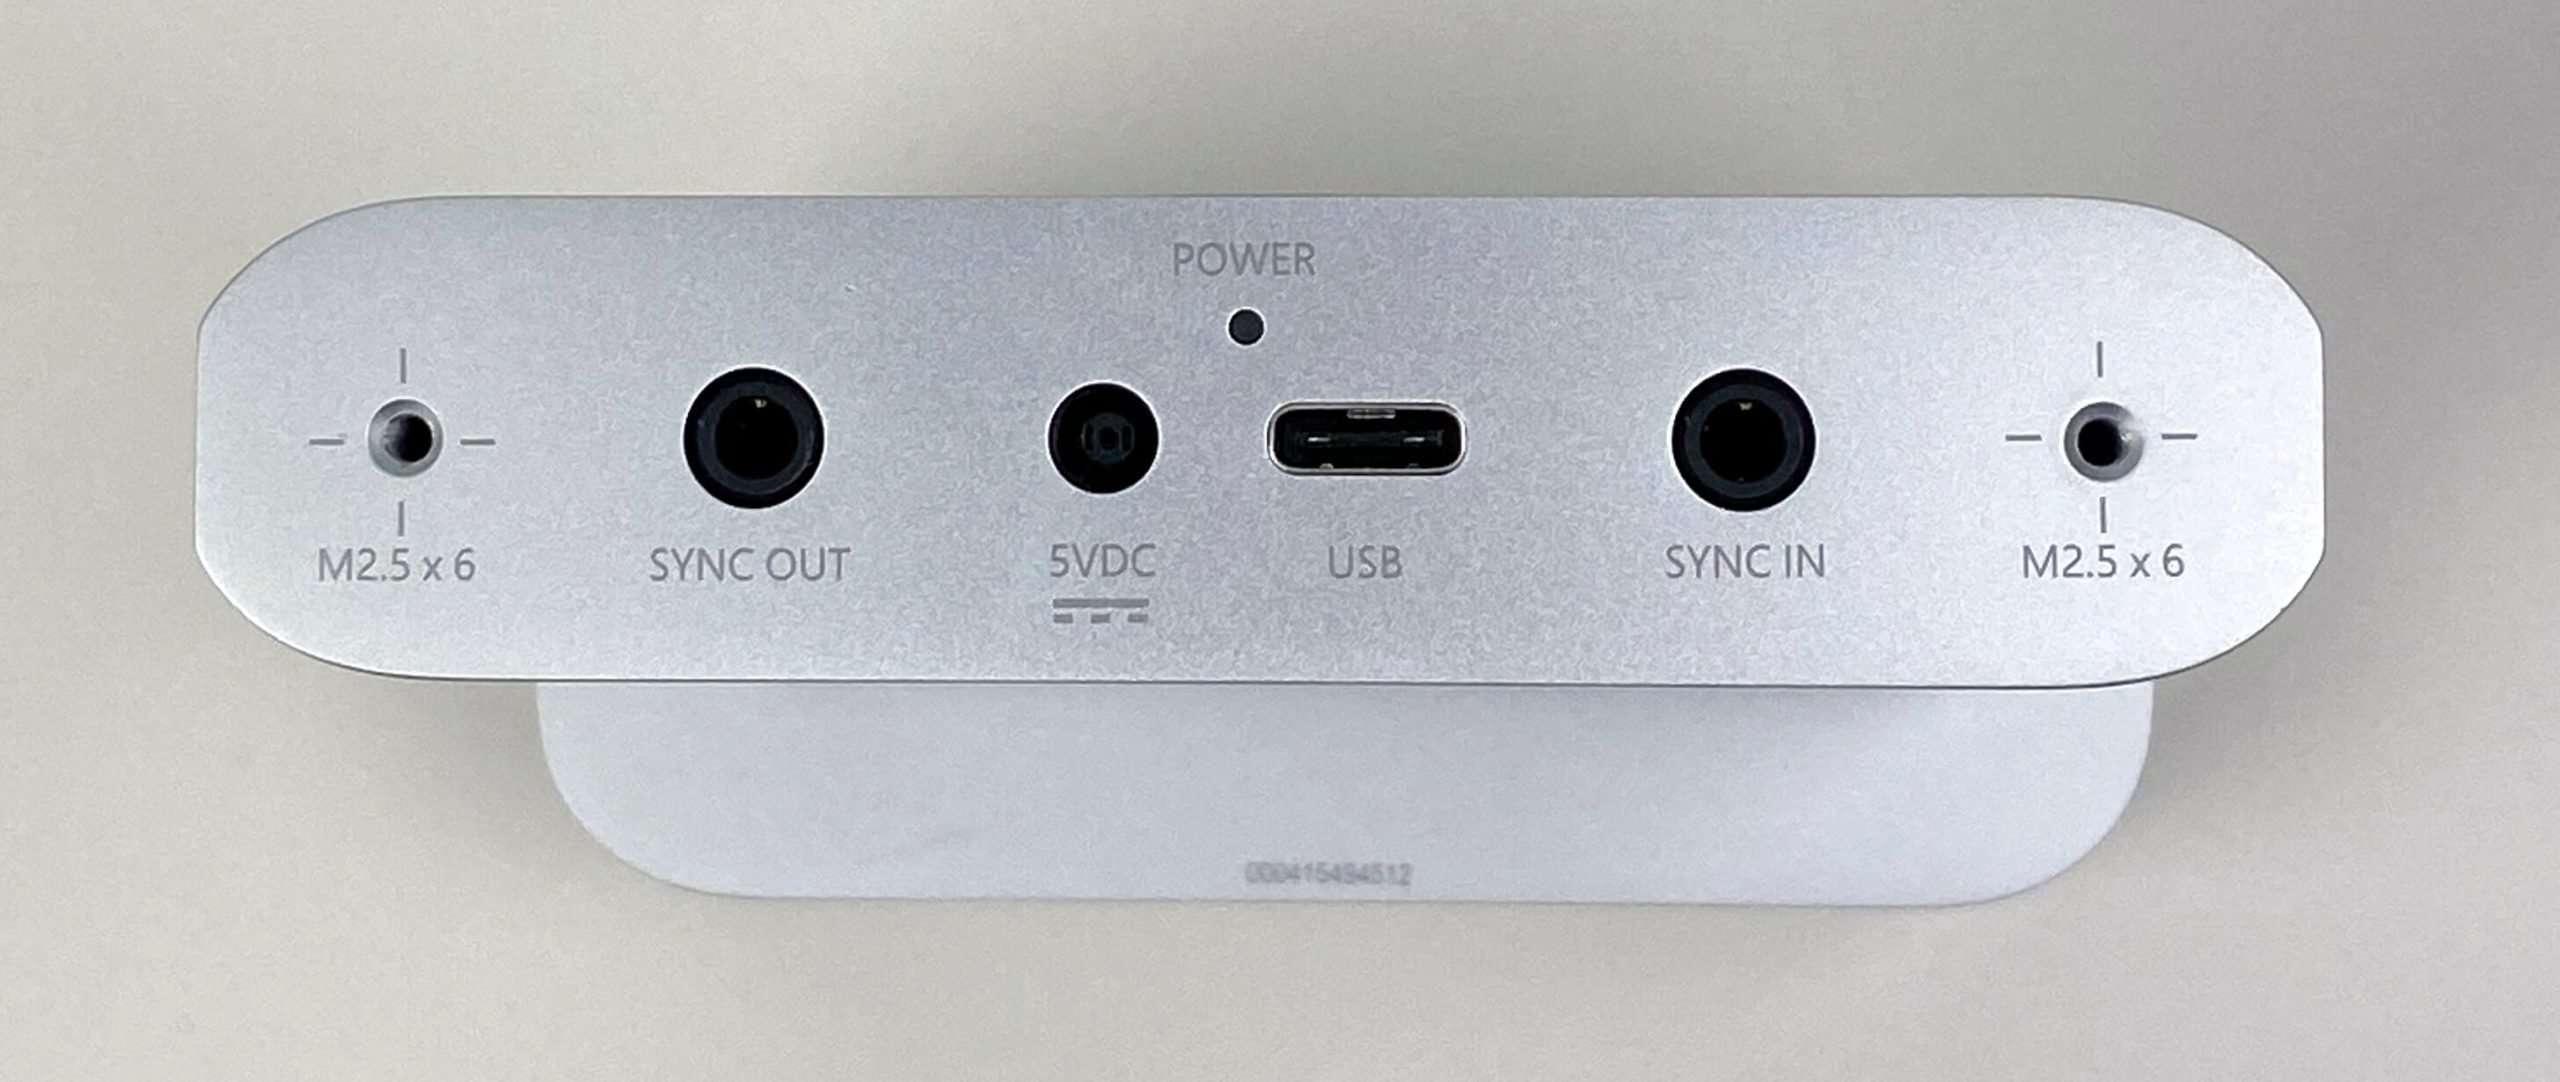 Azure Kinect Sensor – Back